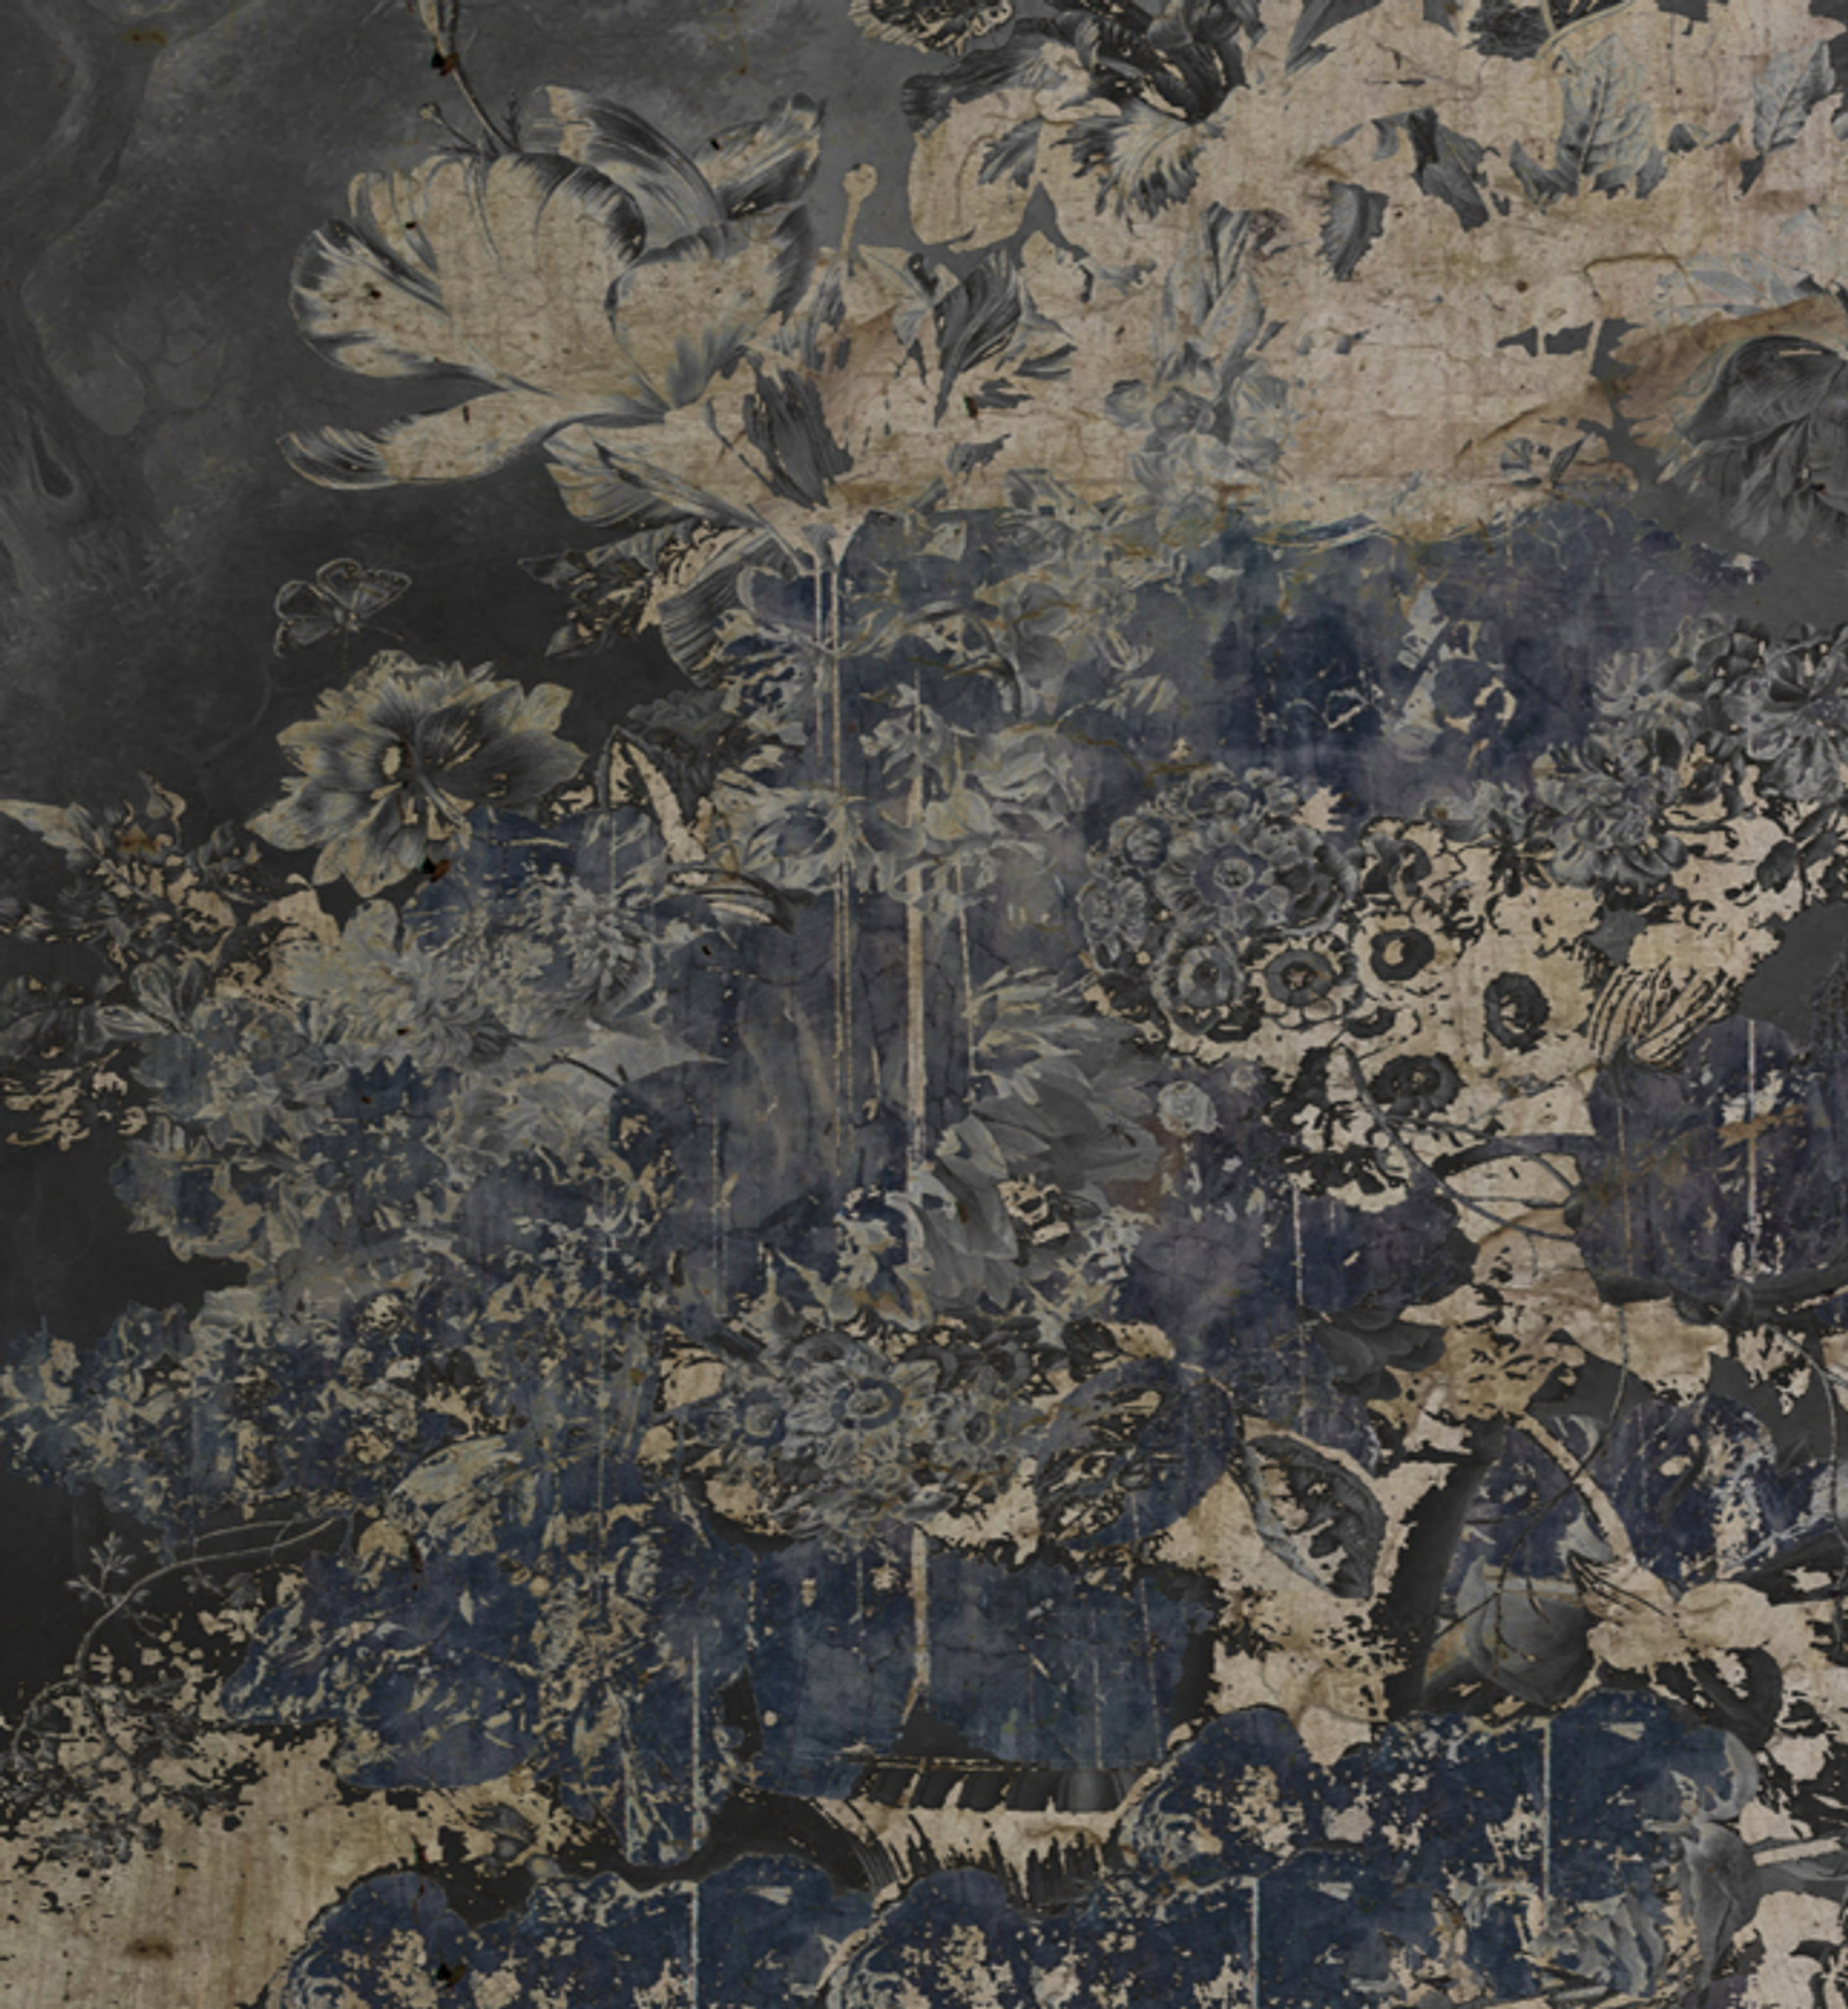 Wallpaper - You Crack Me Up - Beneath a Dark Sky